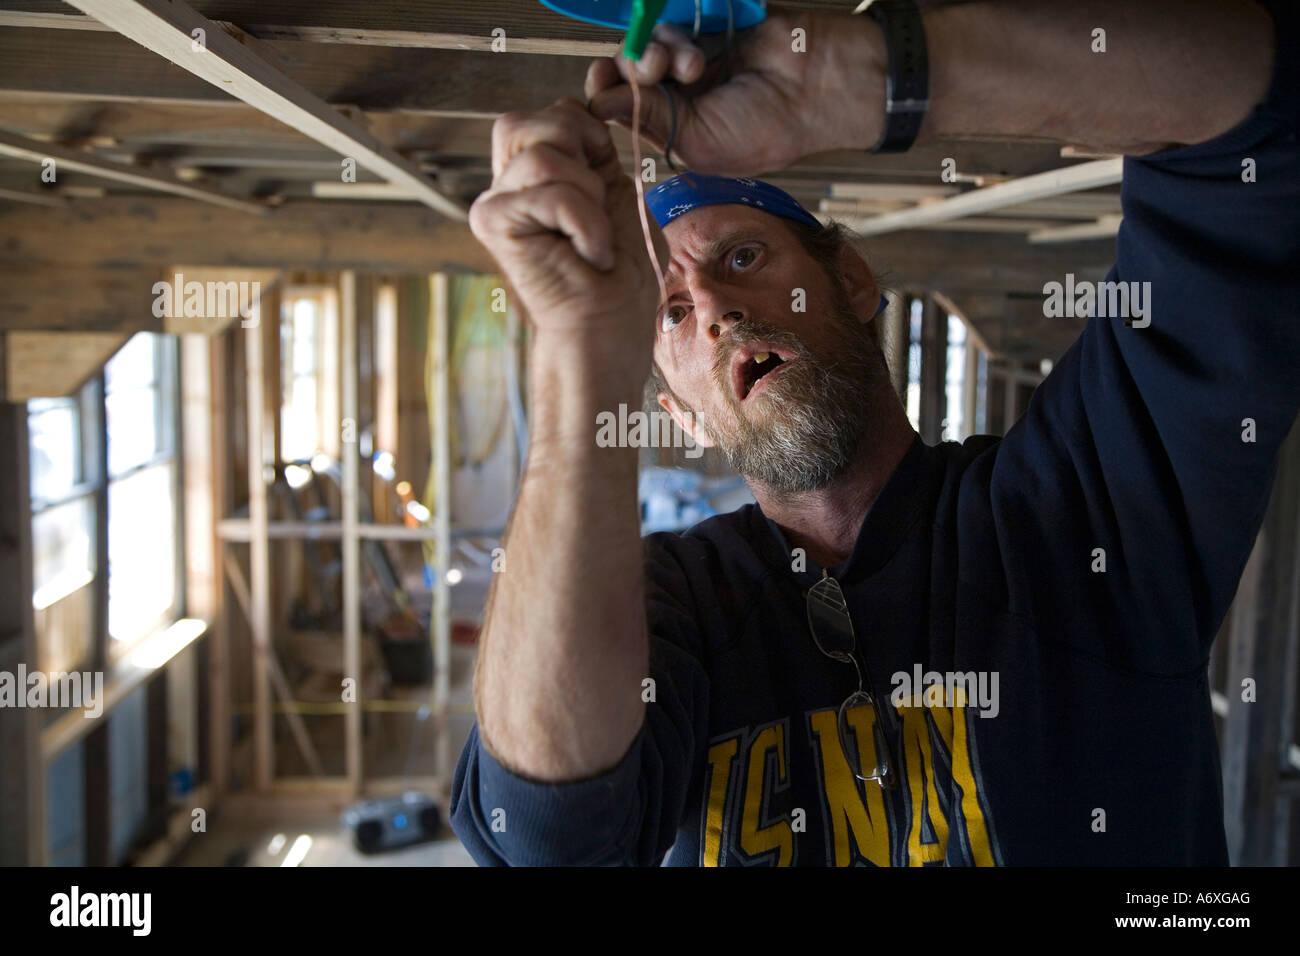 Volunteer Repairs Wiring in House Damaged by Hurricane Katrina - Stock Image